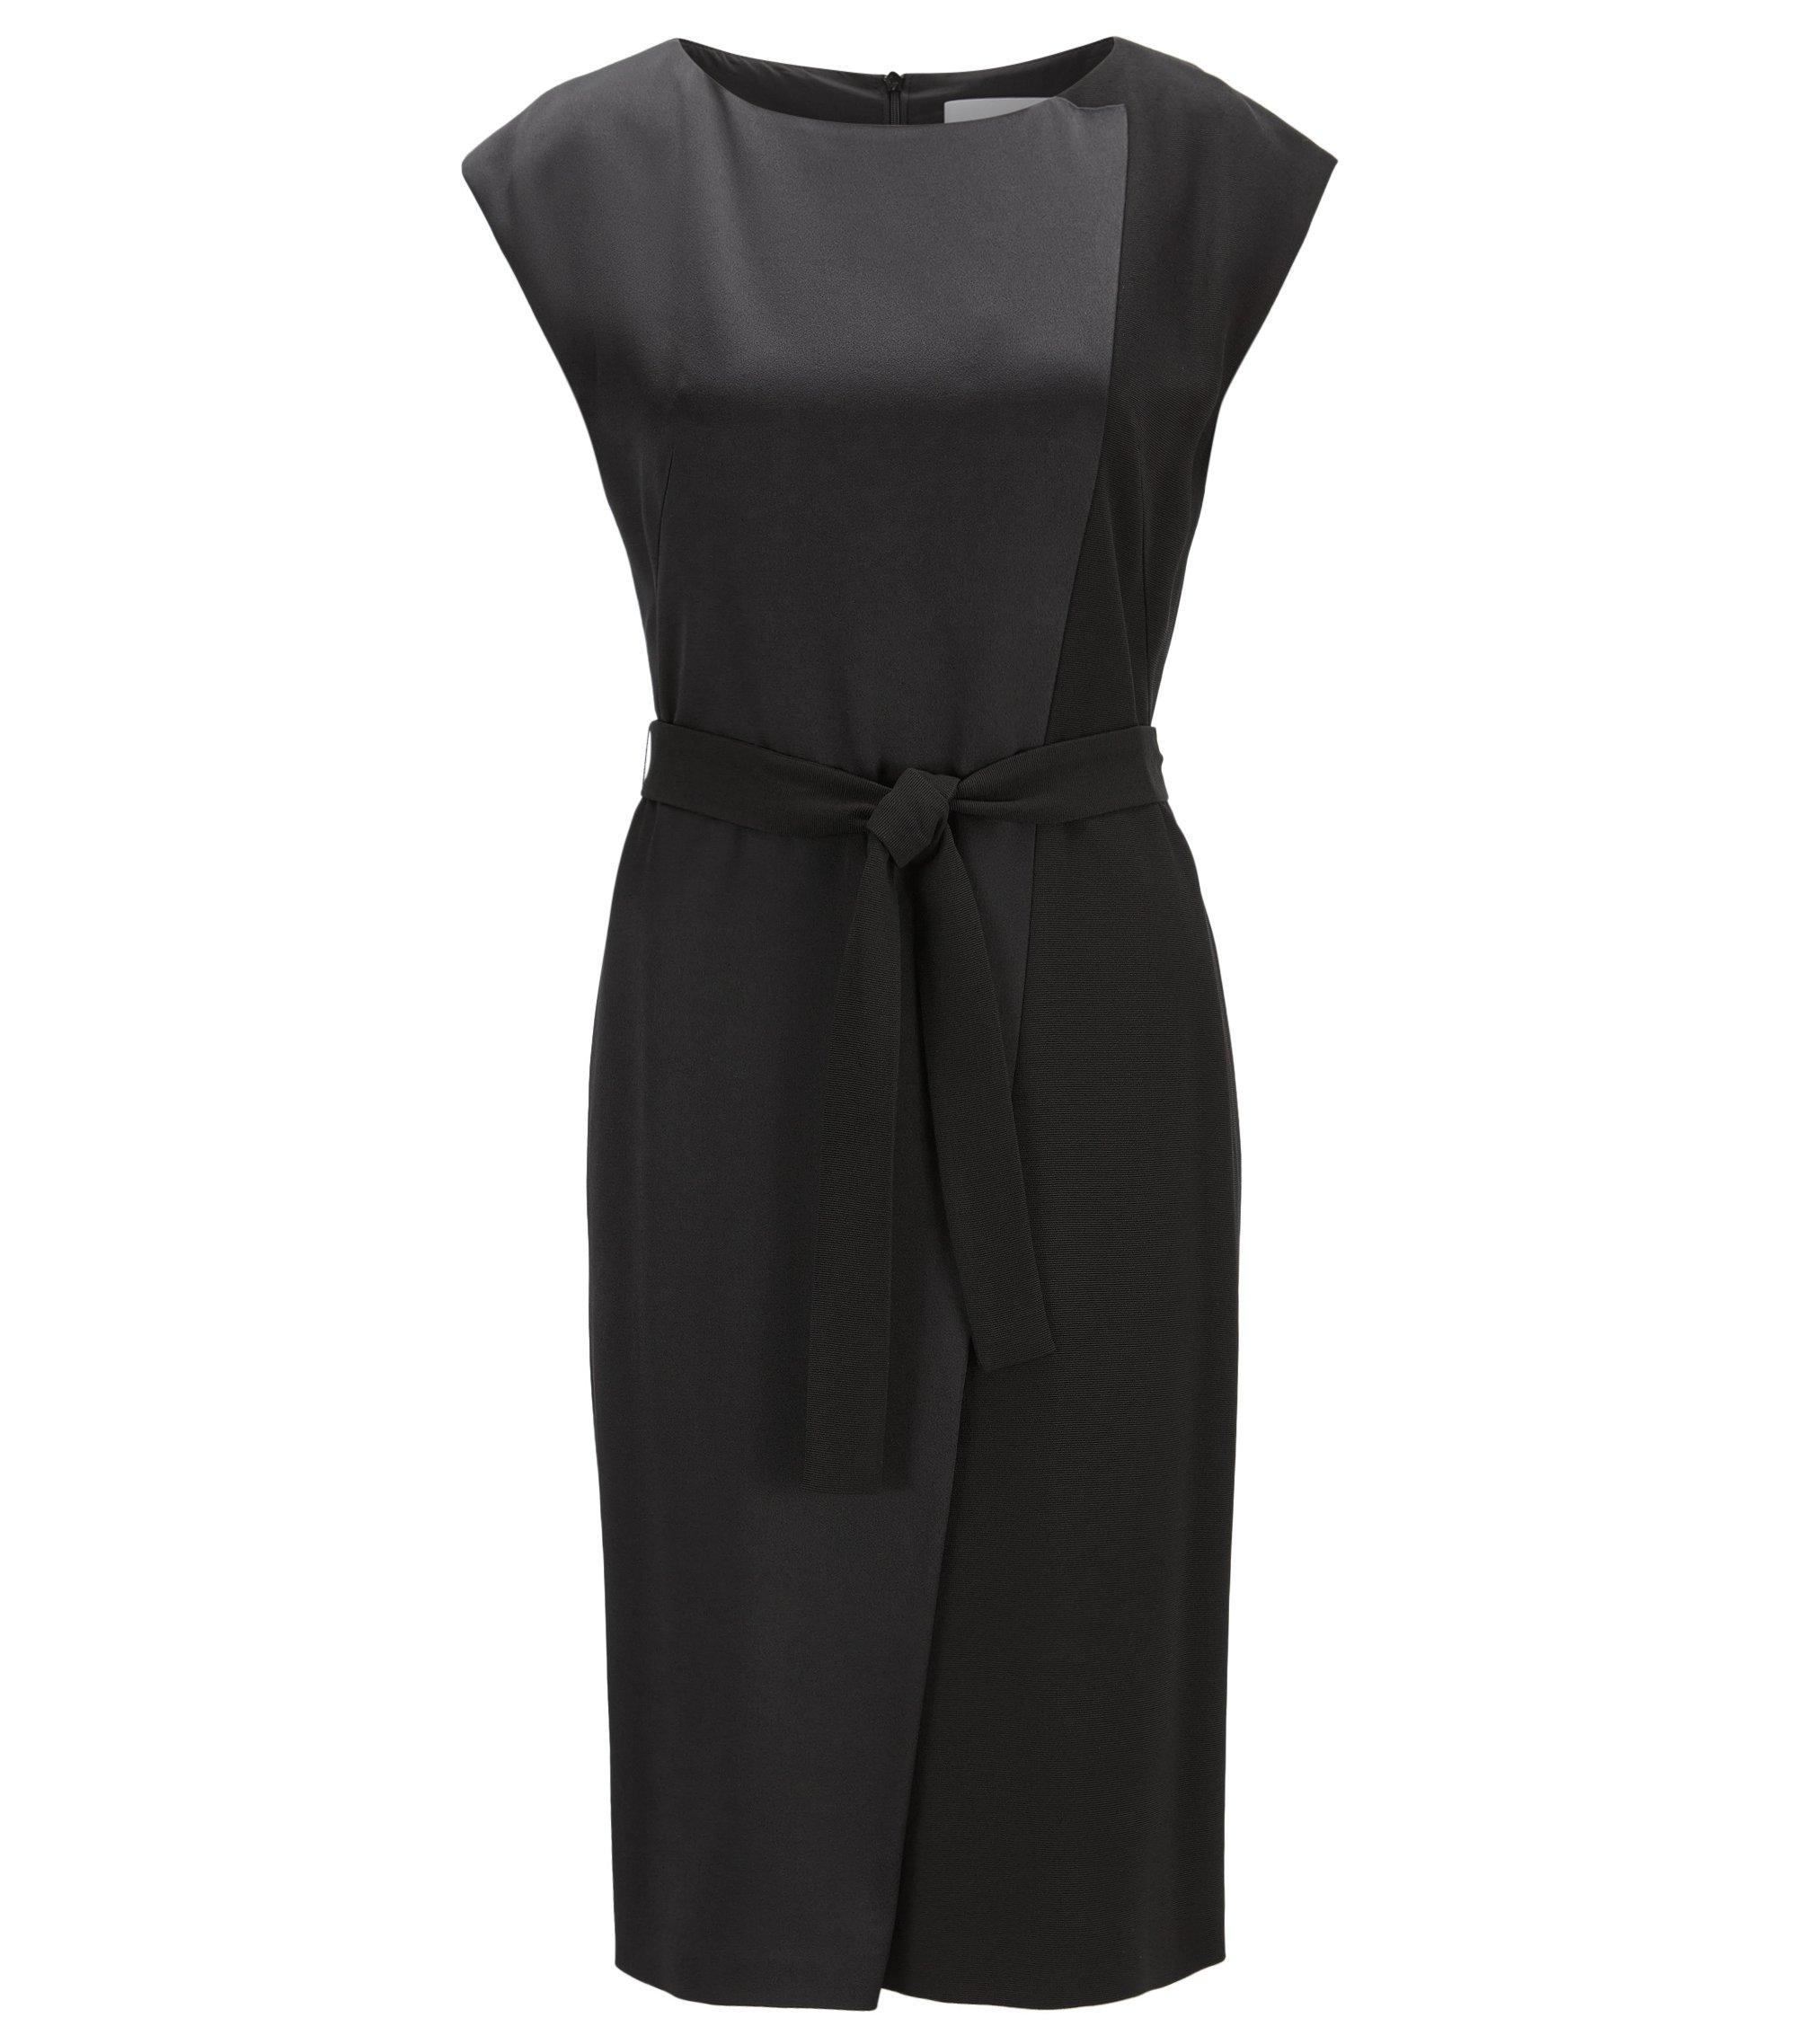 Asymmetrical sleeveless dress in contrast fabrics, Black